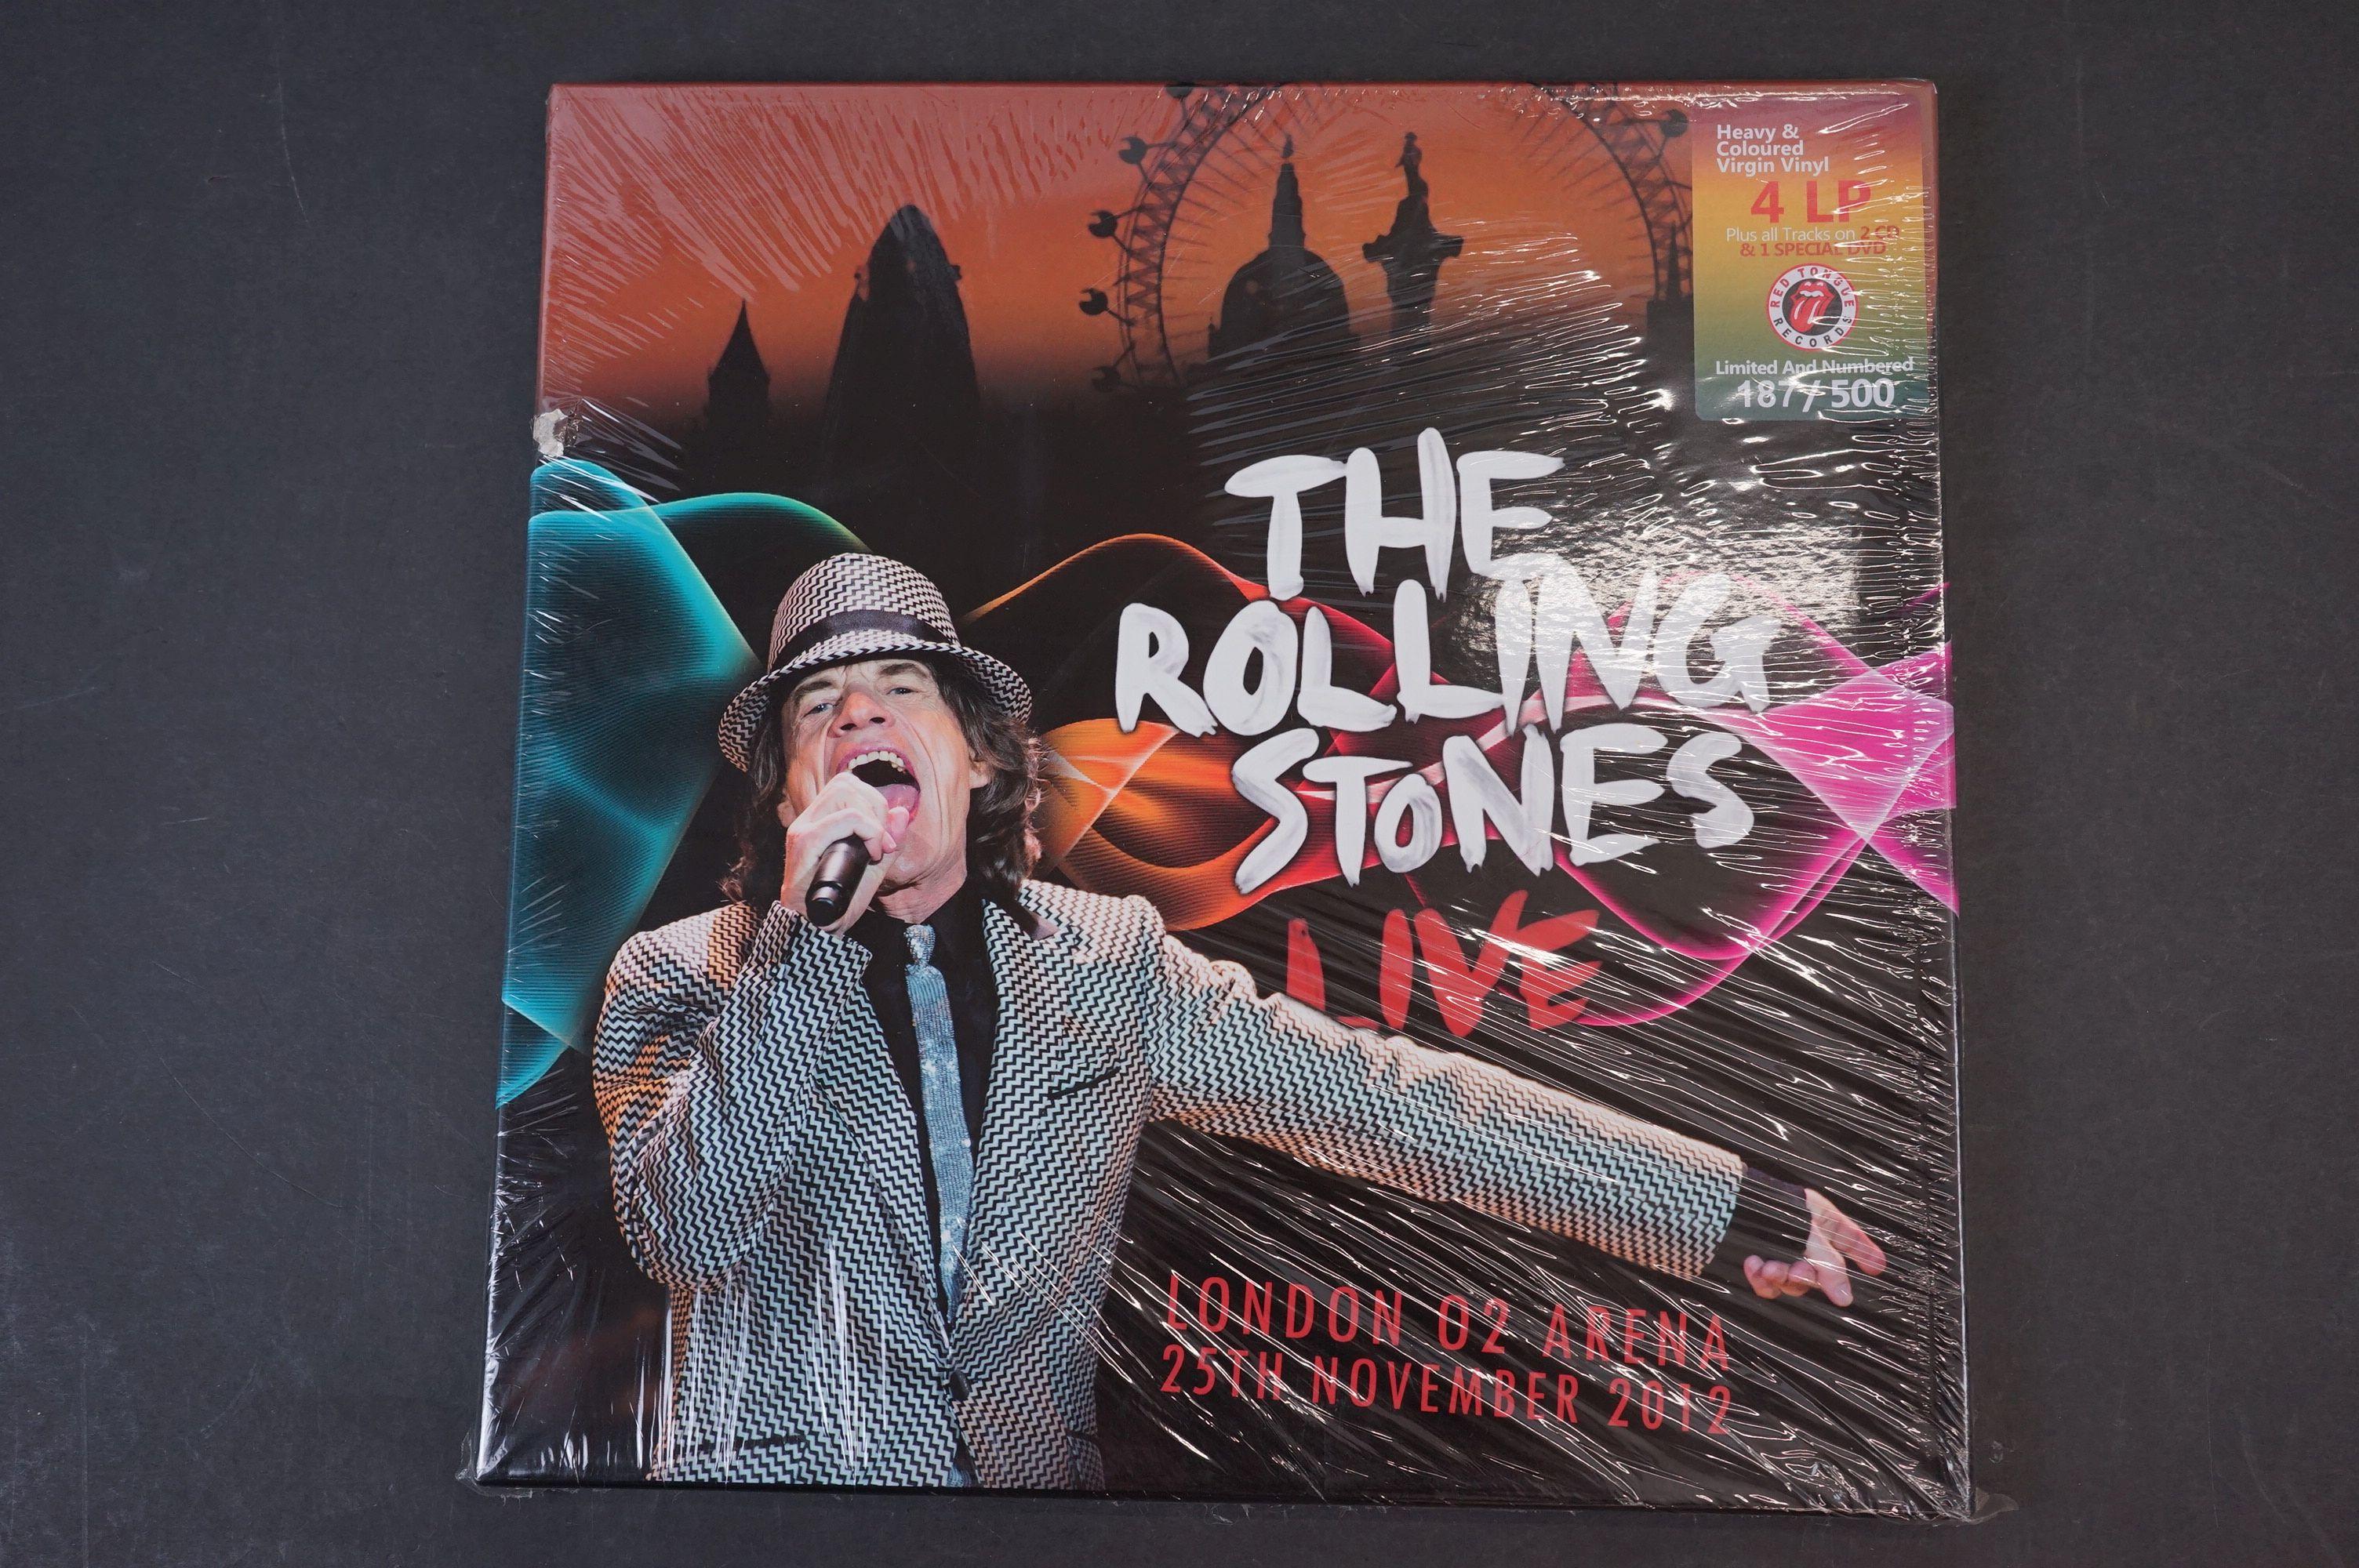 Vinyl - ltd edn The Rolling Stones London 02 Arena 4 LP / 2 CD / 1 DVD Box Set RTR028, heavy